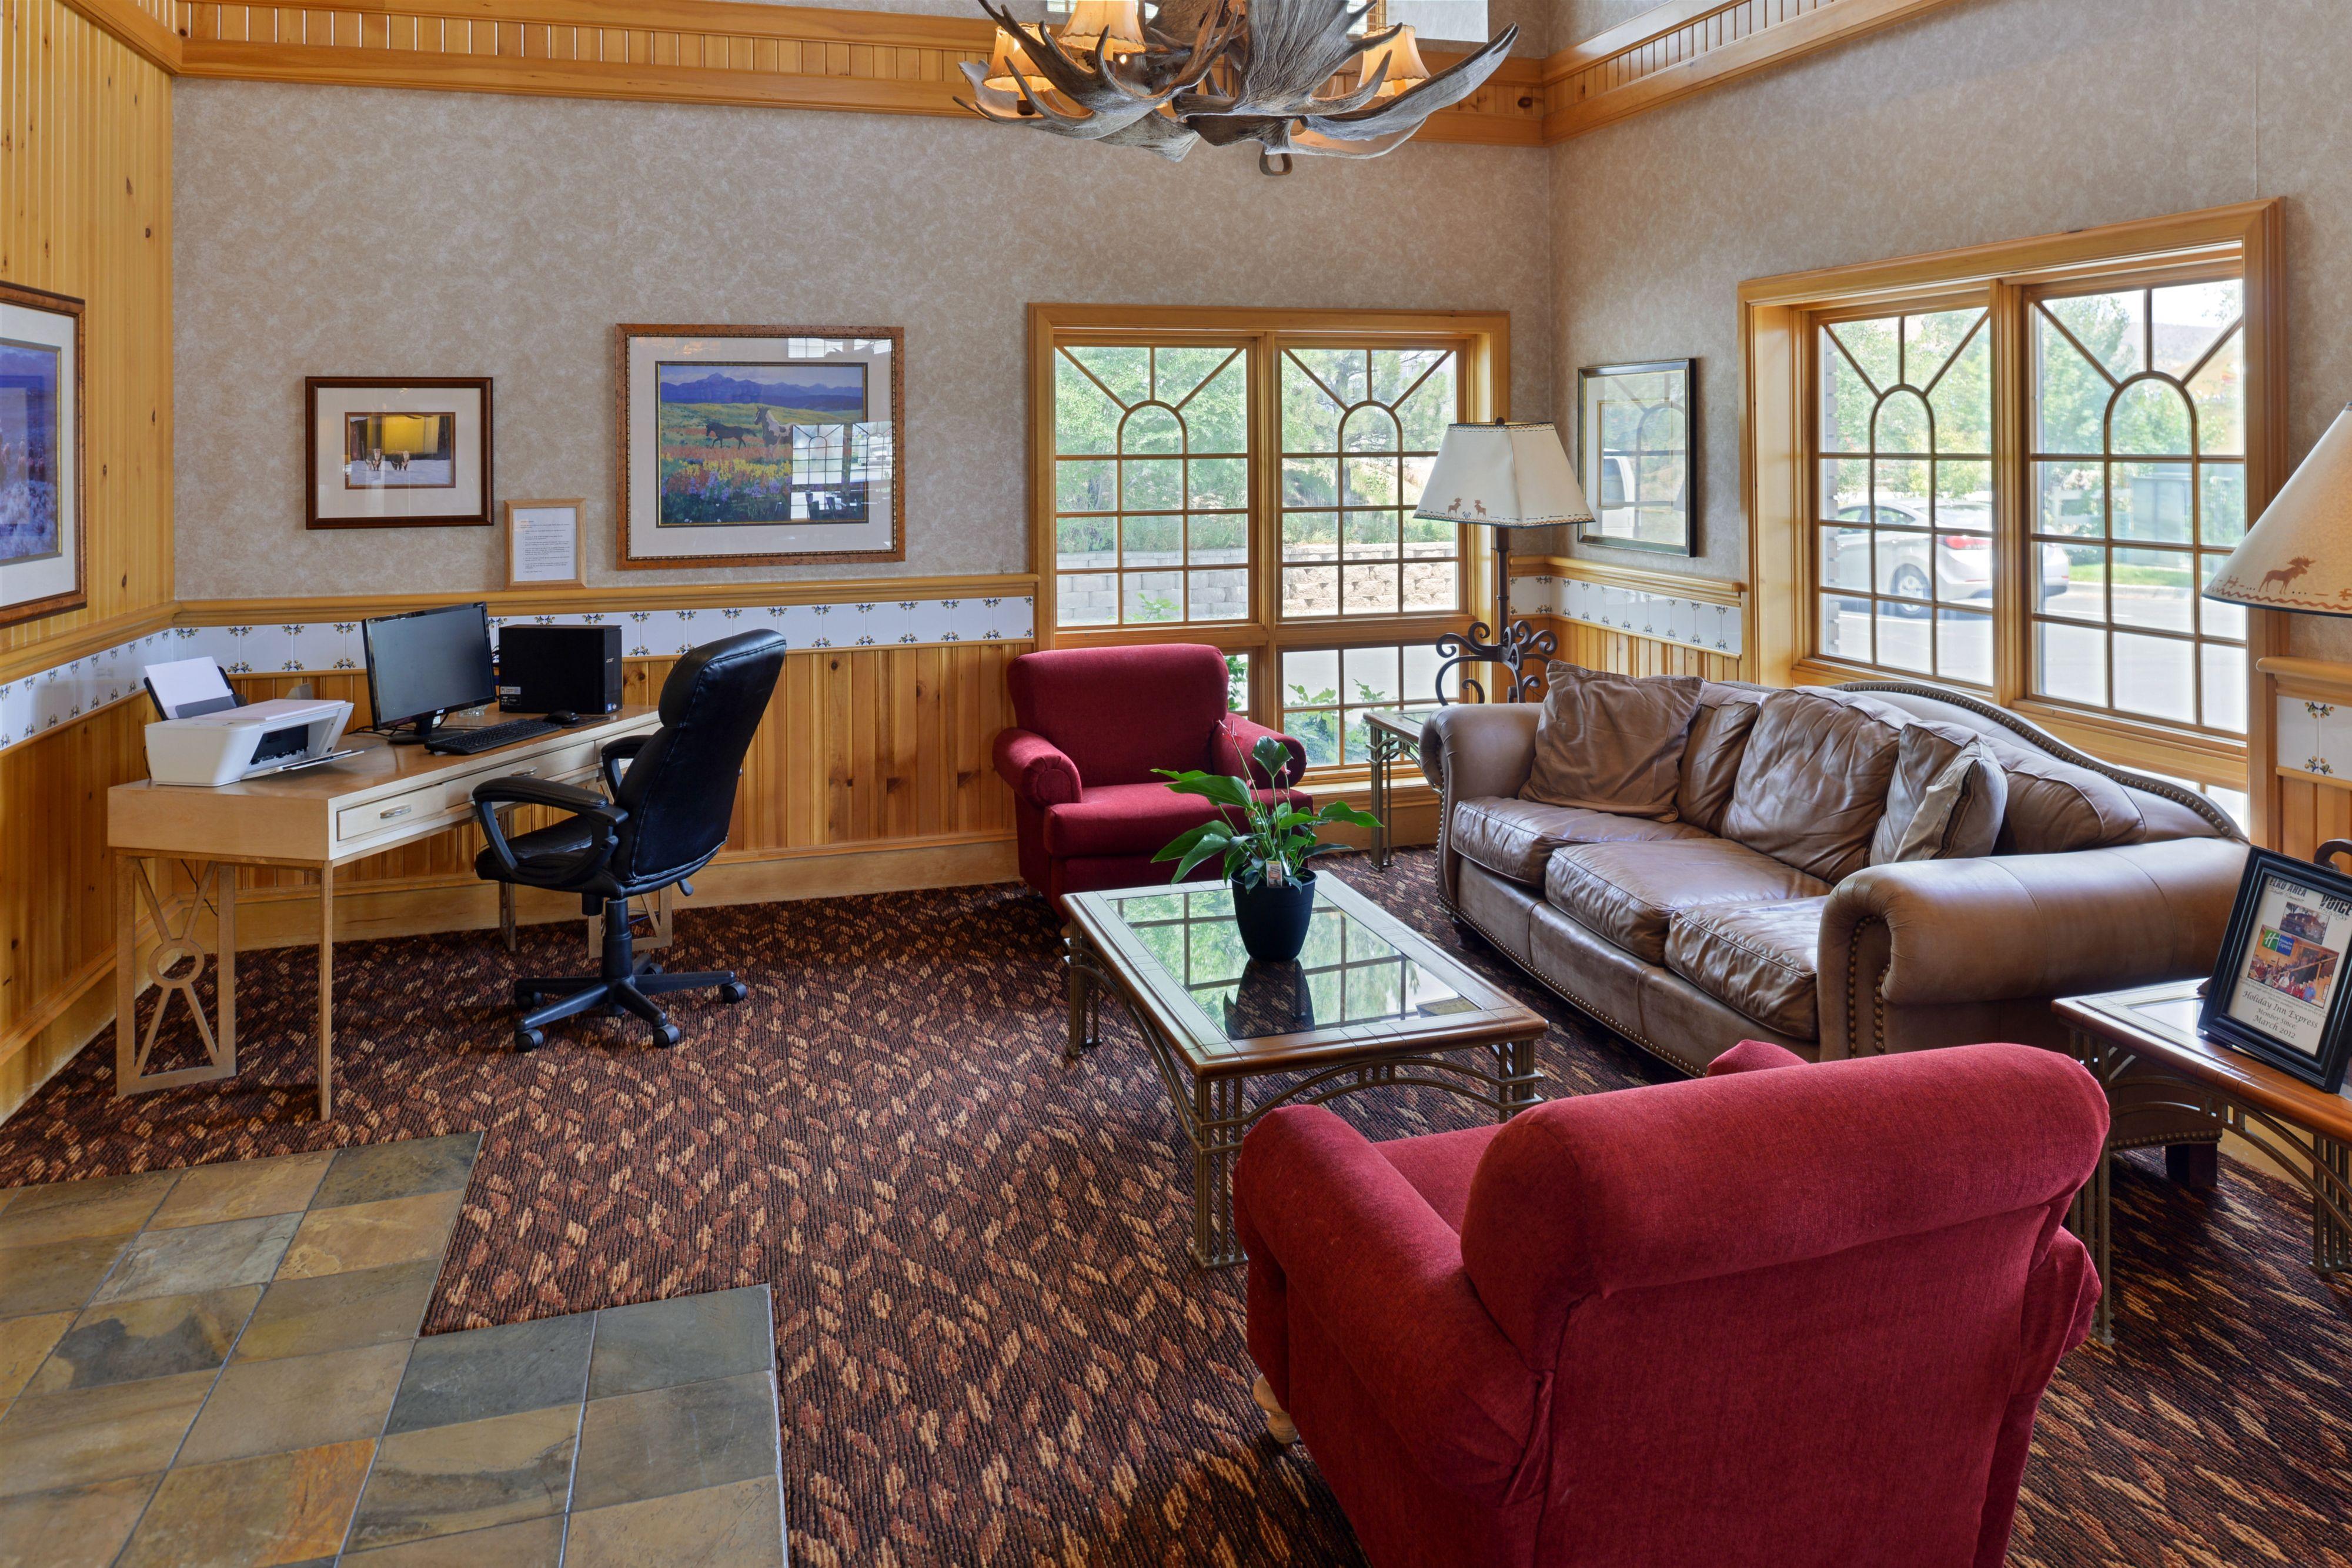 Holiday Inn Express & Suites Elko image 3